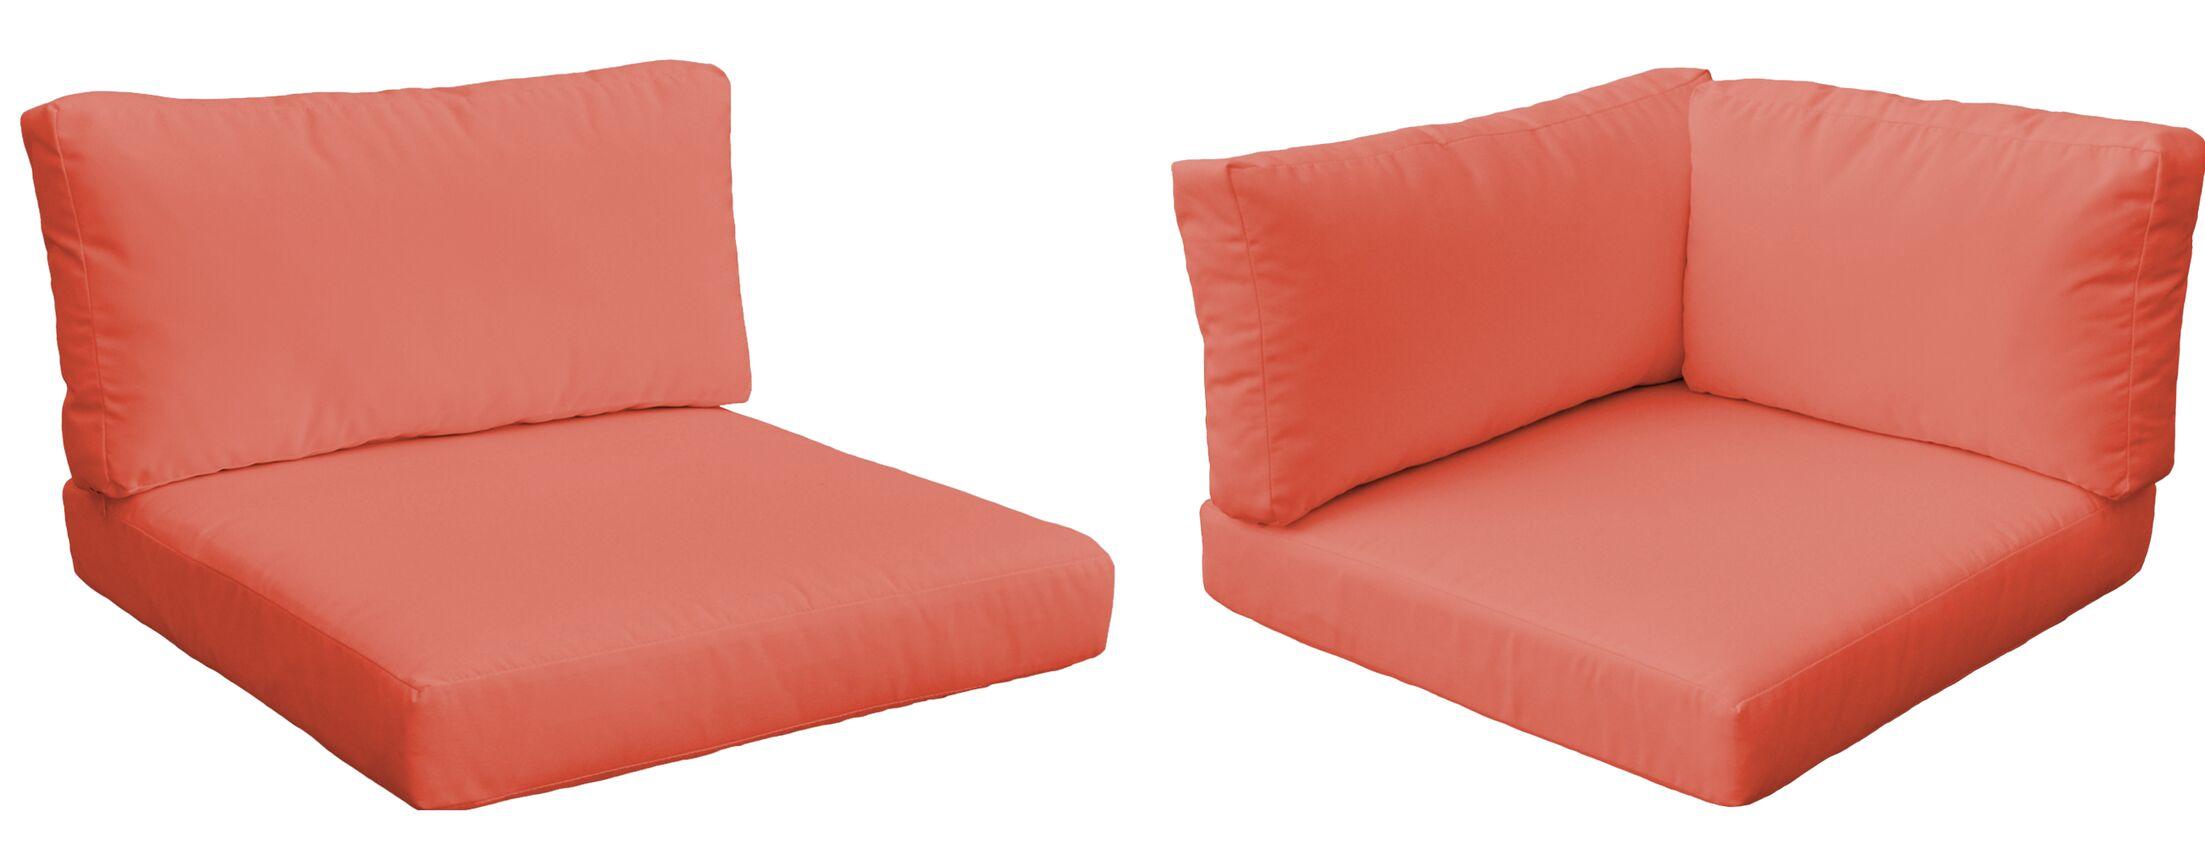 Monaco Outdoor 17 Piece Lounge Chair Cushion Set Fabric: Tangerine